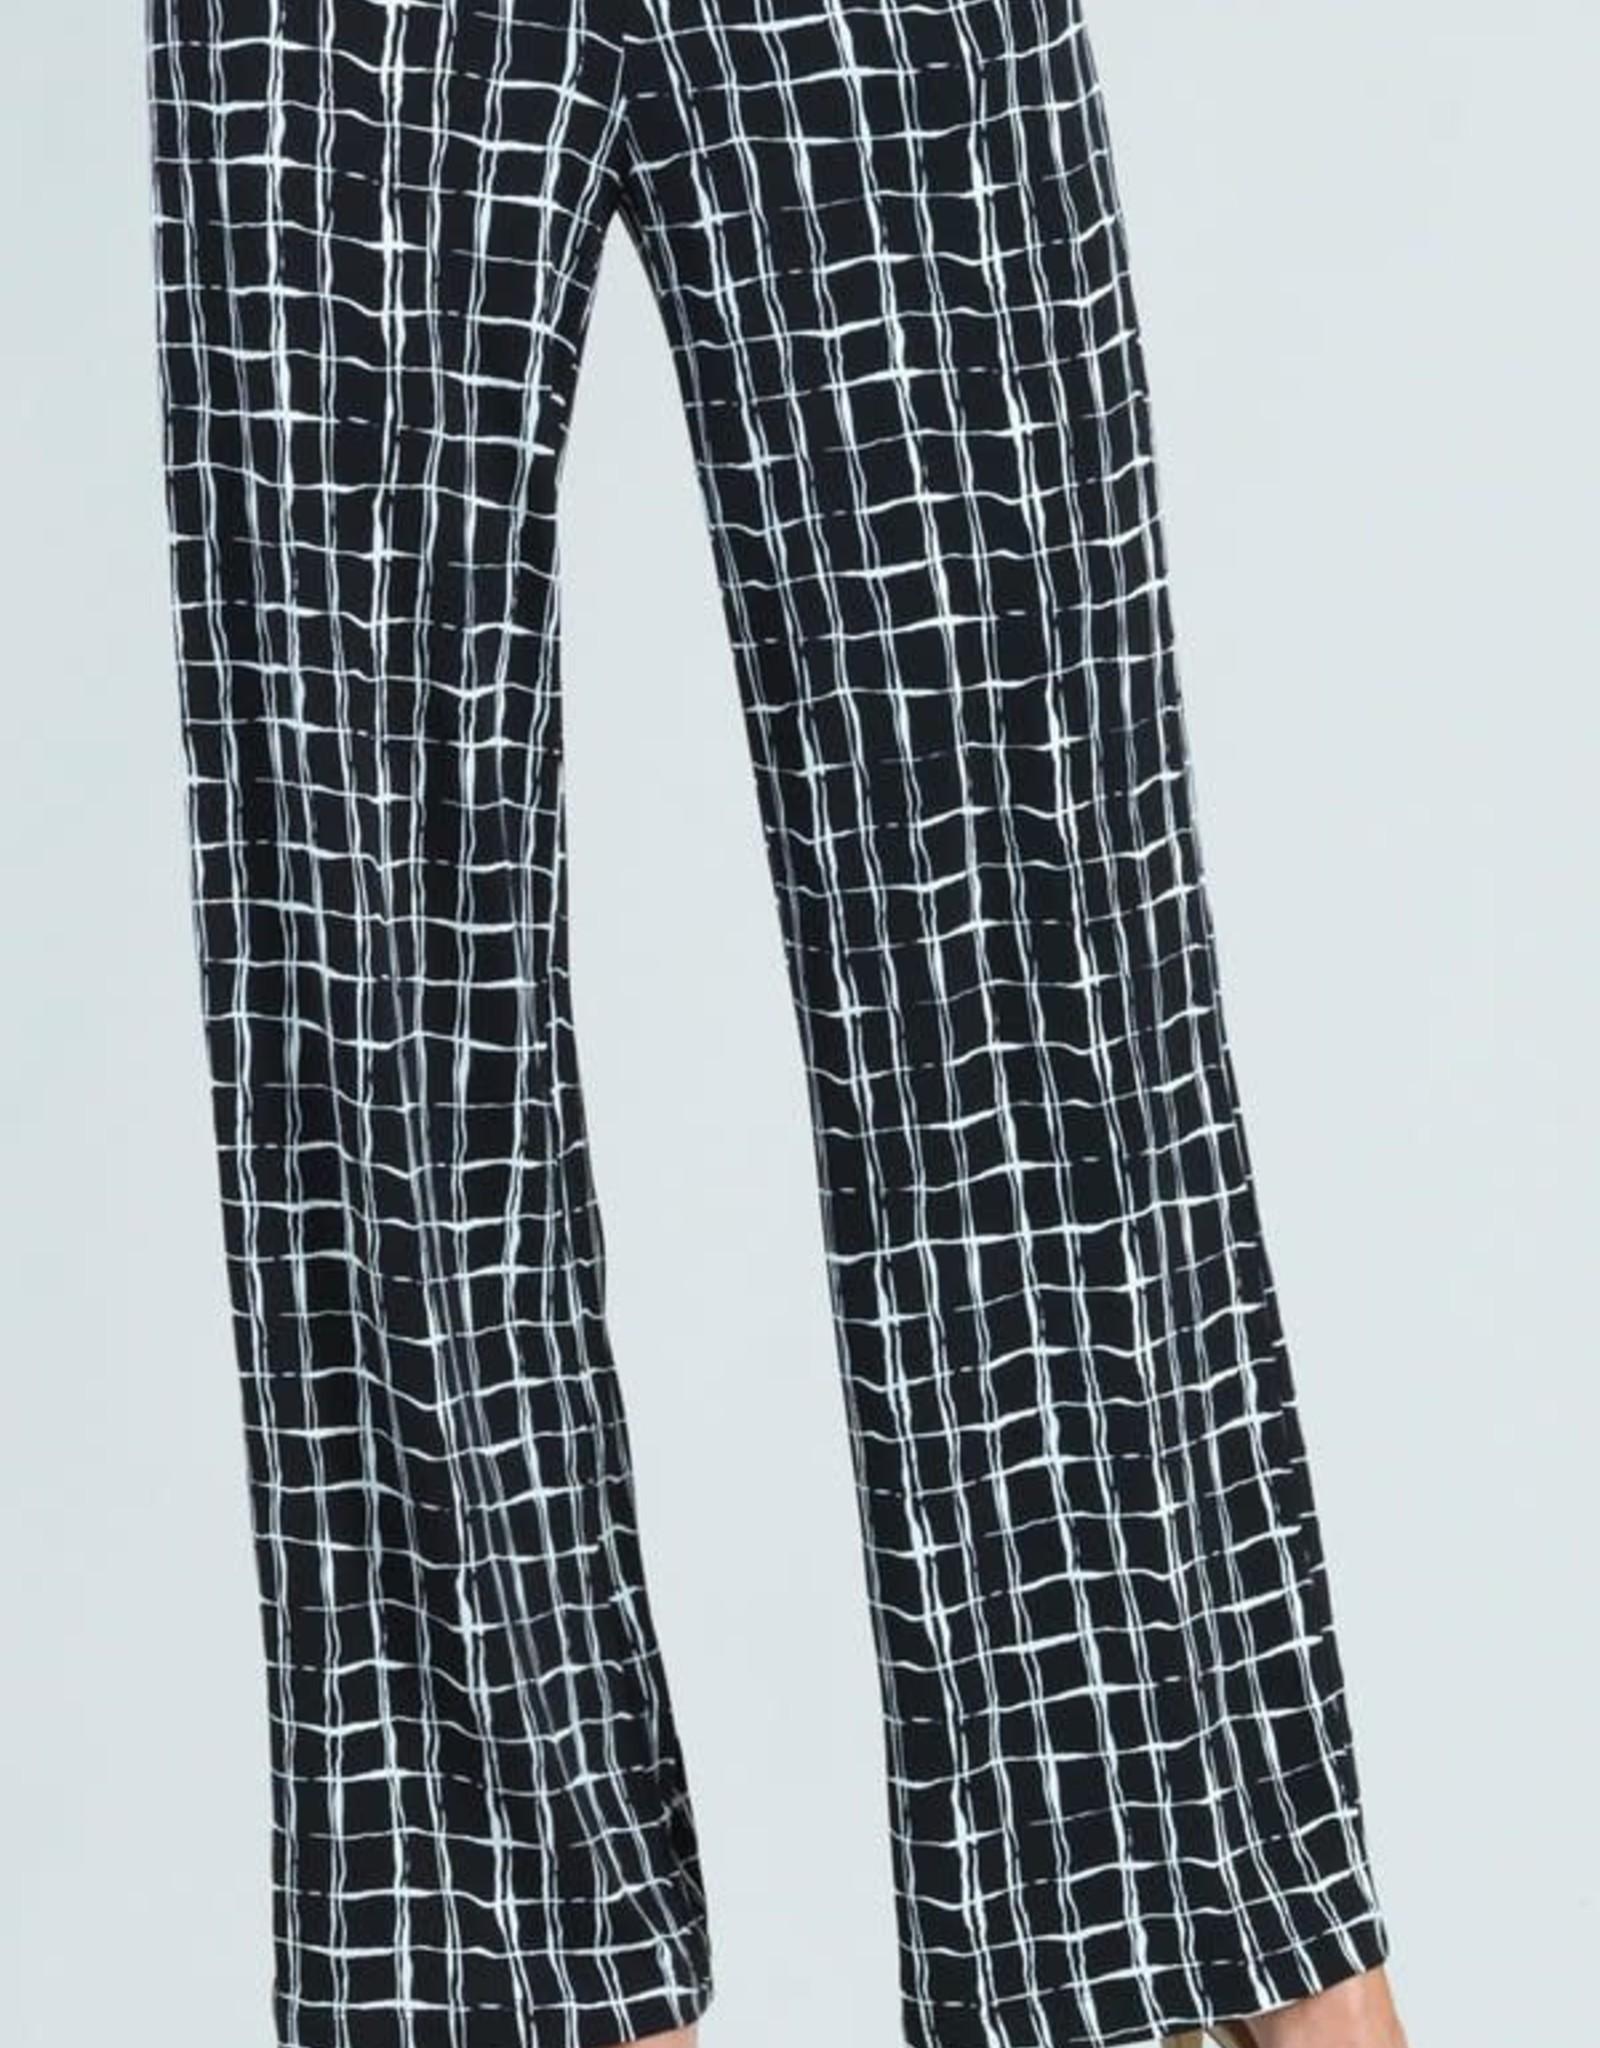 - Black/White Geo Print Straight Leg Pull-On Pant